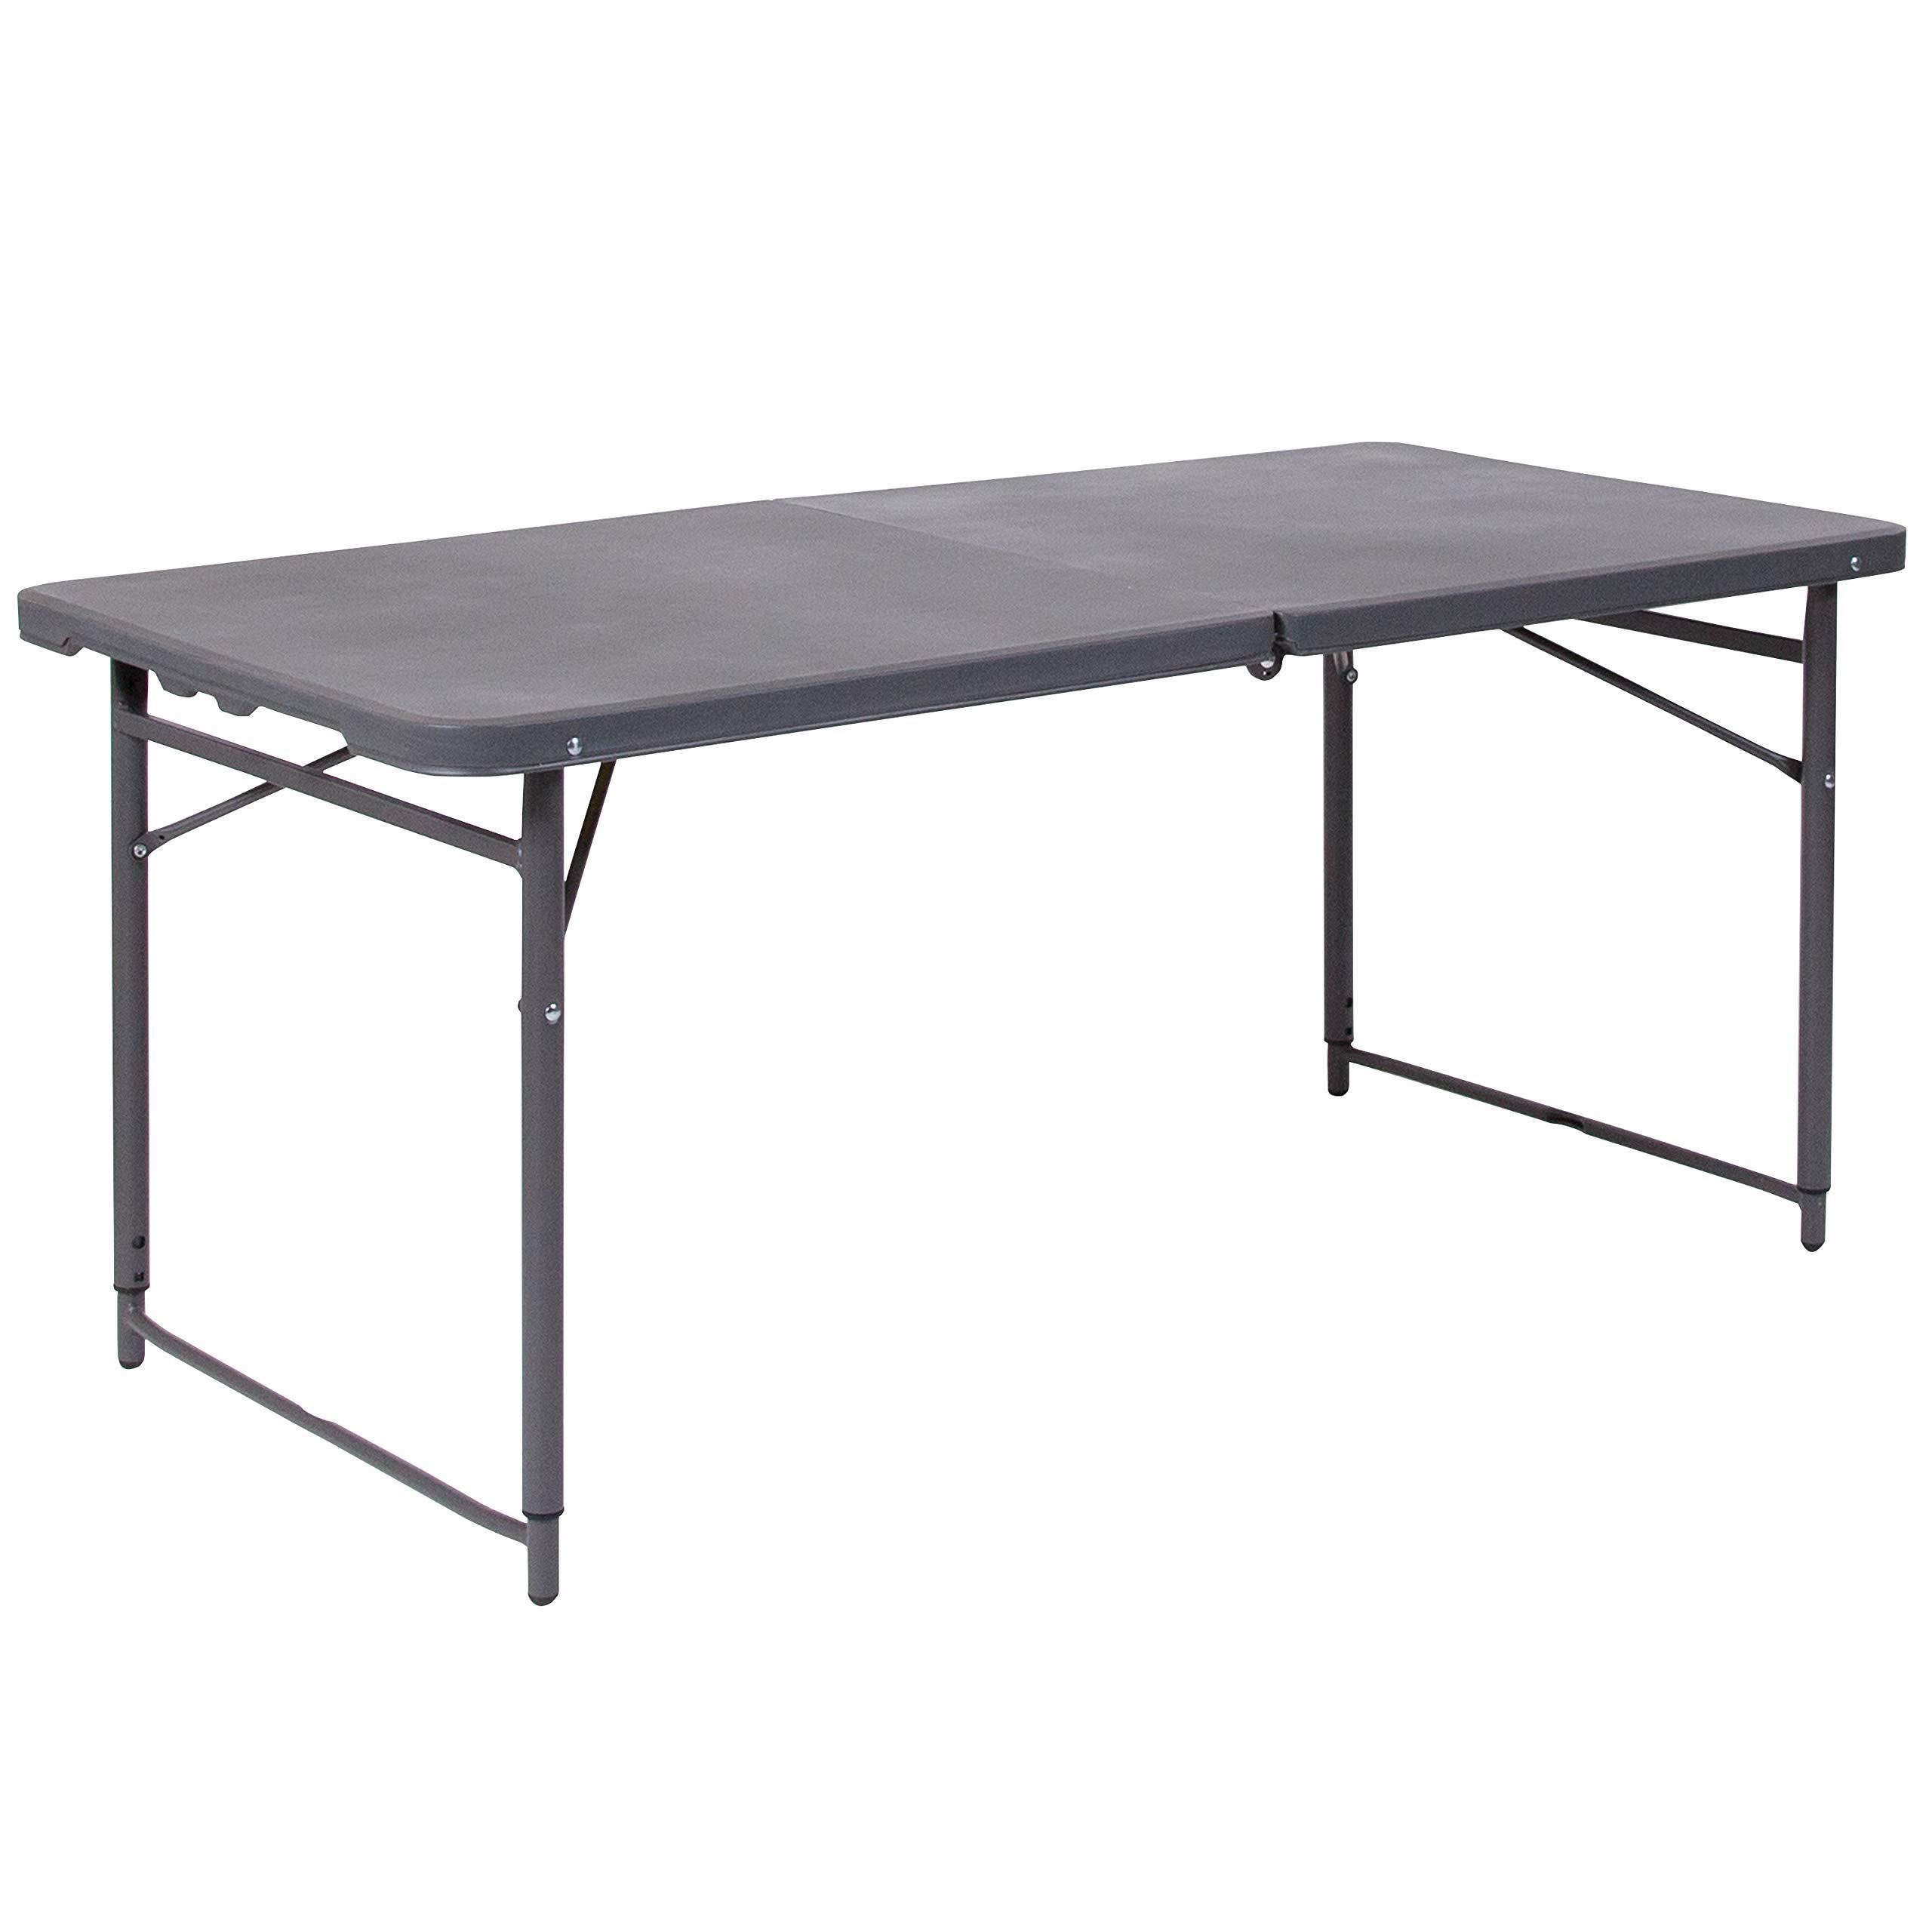 Flash Furniture 23.5''W x 48.25''L Height Adjustable Bi-Fold Dark Gray Plastic Folding Table with Carrying Handle